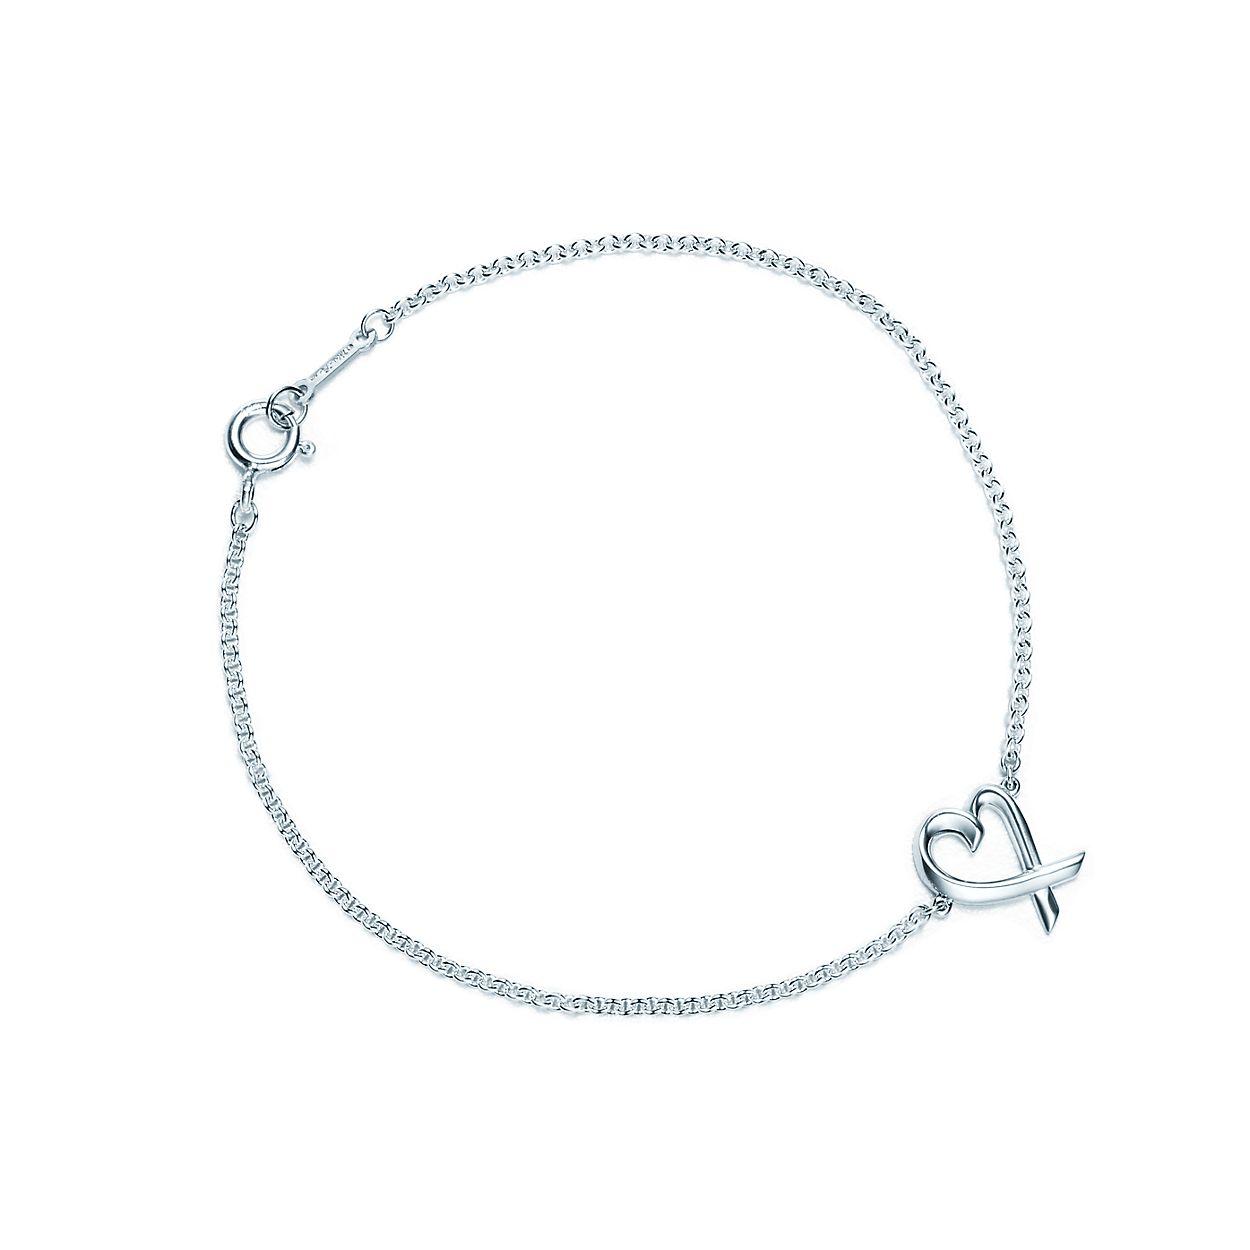 Paloma Pico Loving Heart Bracelet